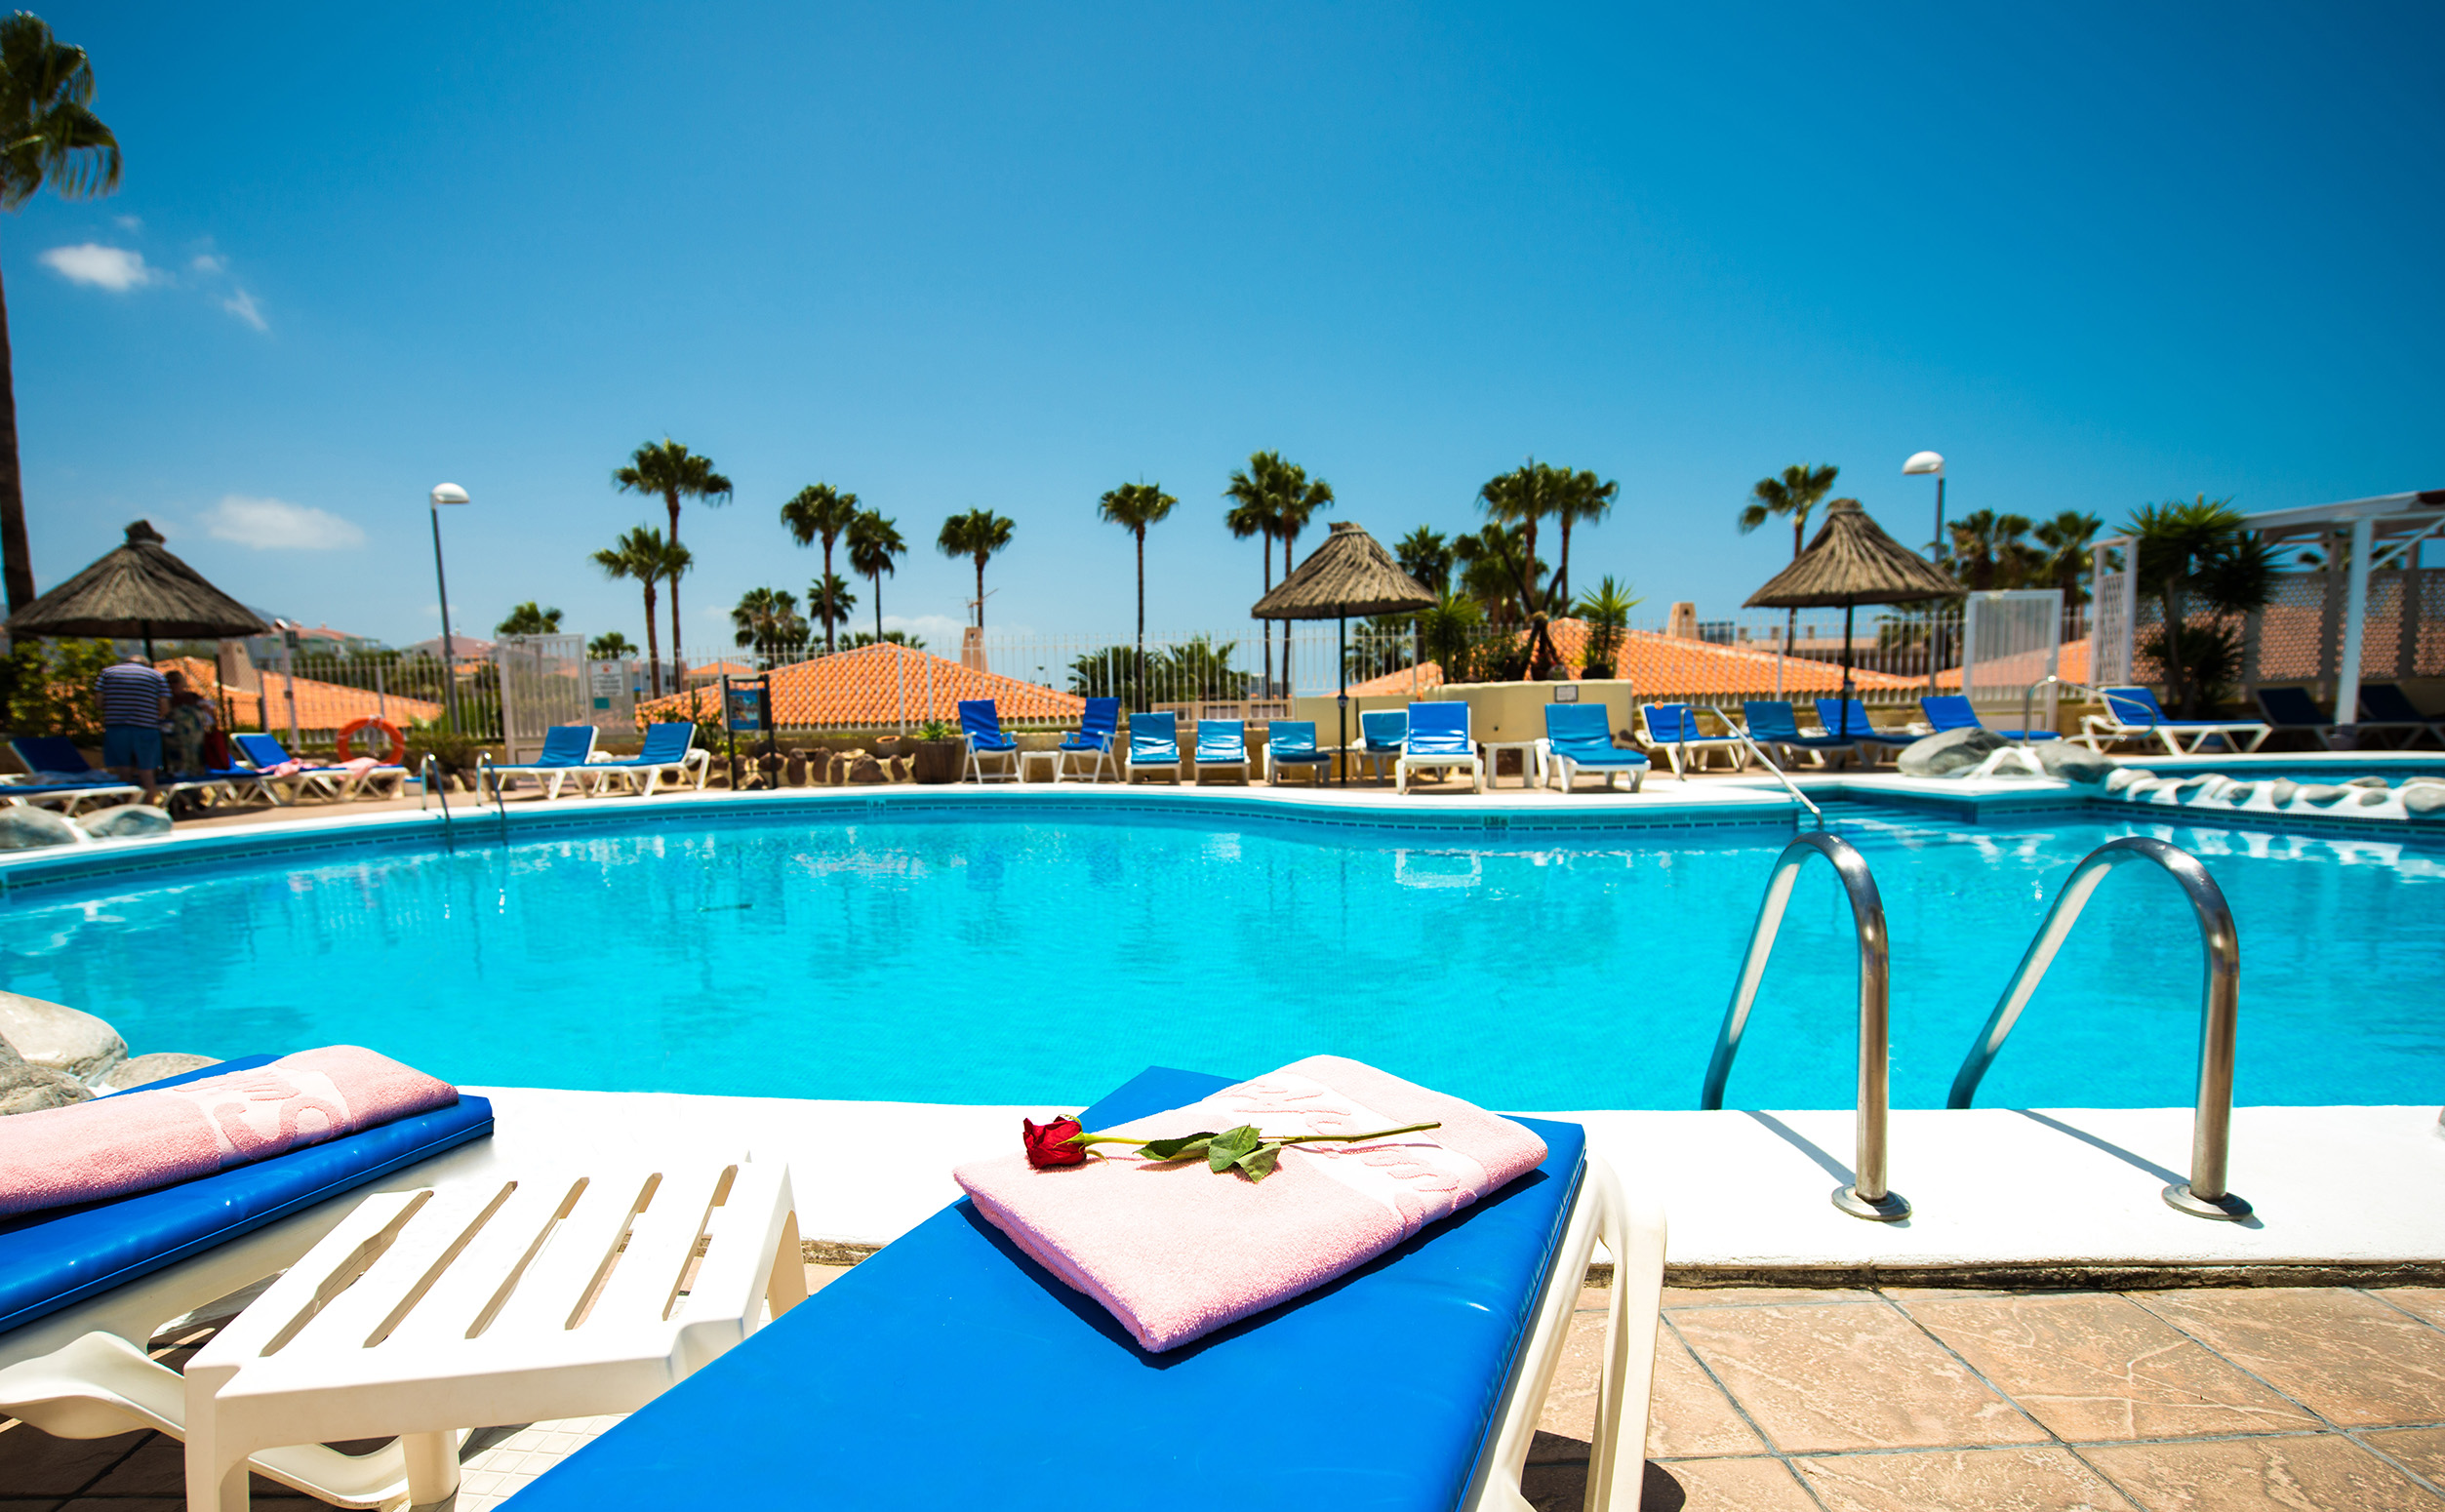 Sueño Azul Swimming Pool